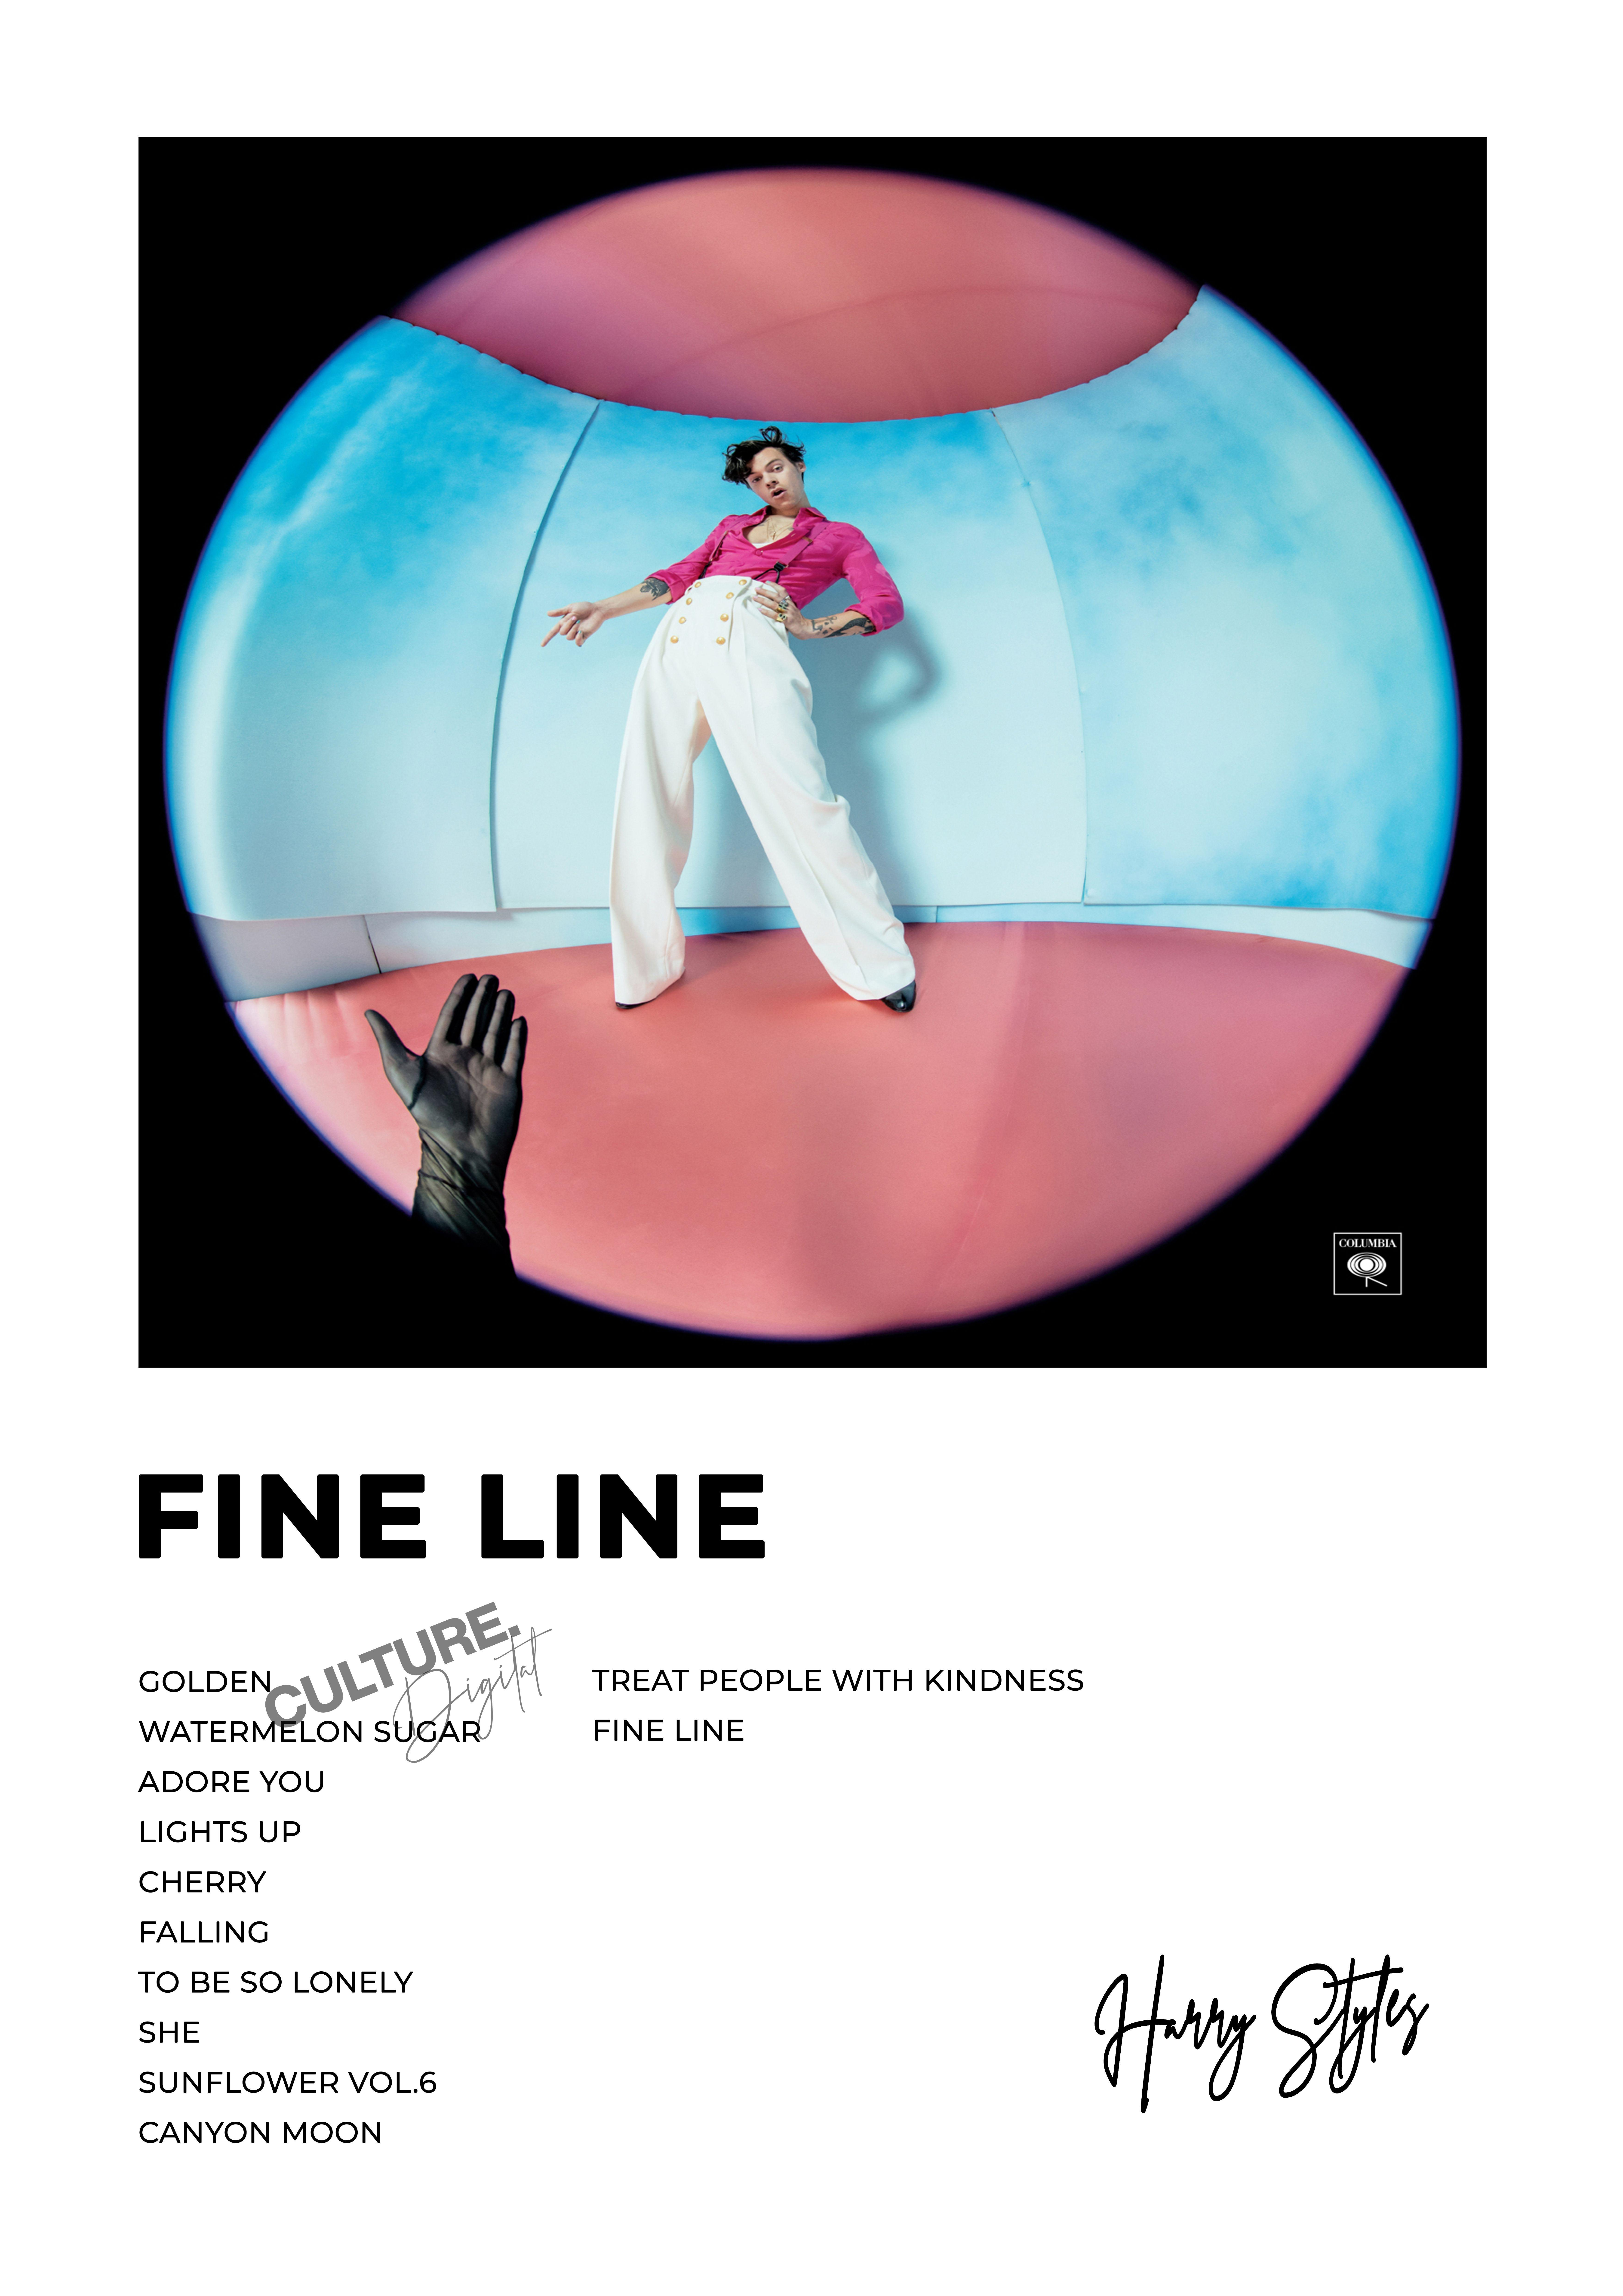 Harry Styles Fine Line Polaroid Album Cover